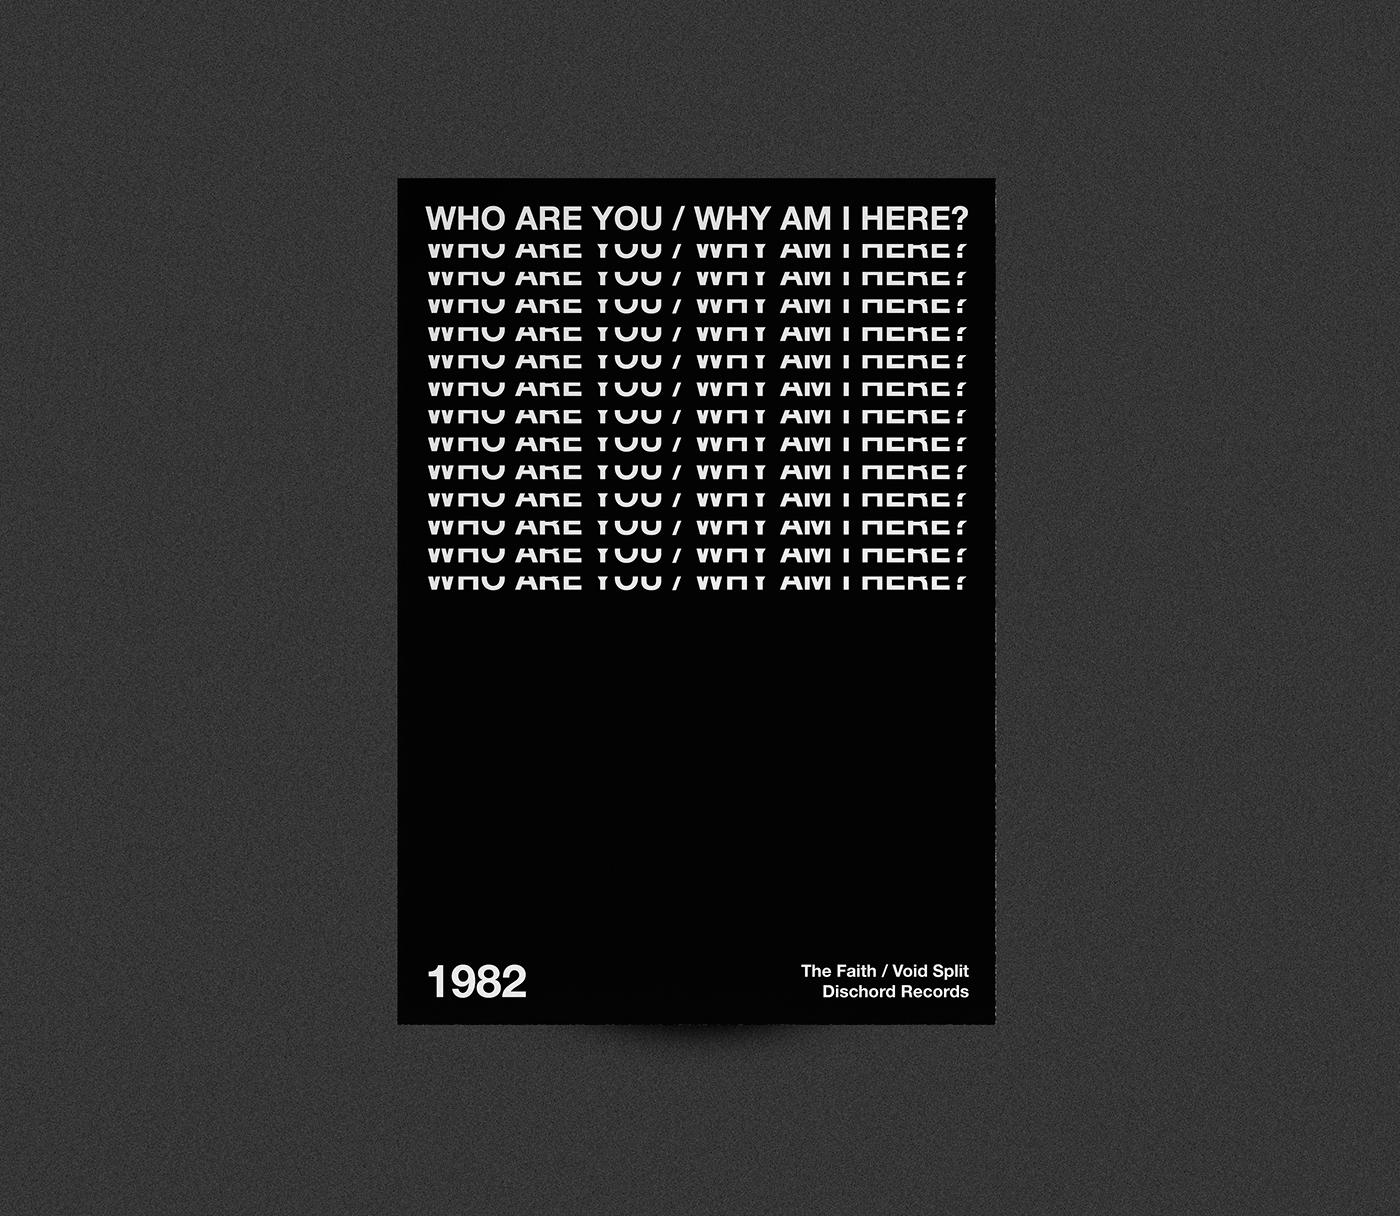 poster plakat helvetica univers akzidenz Futura Punk-Rock hardcore-punk type typography